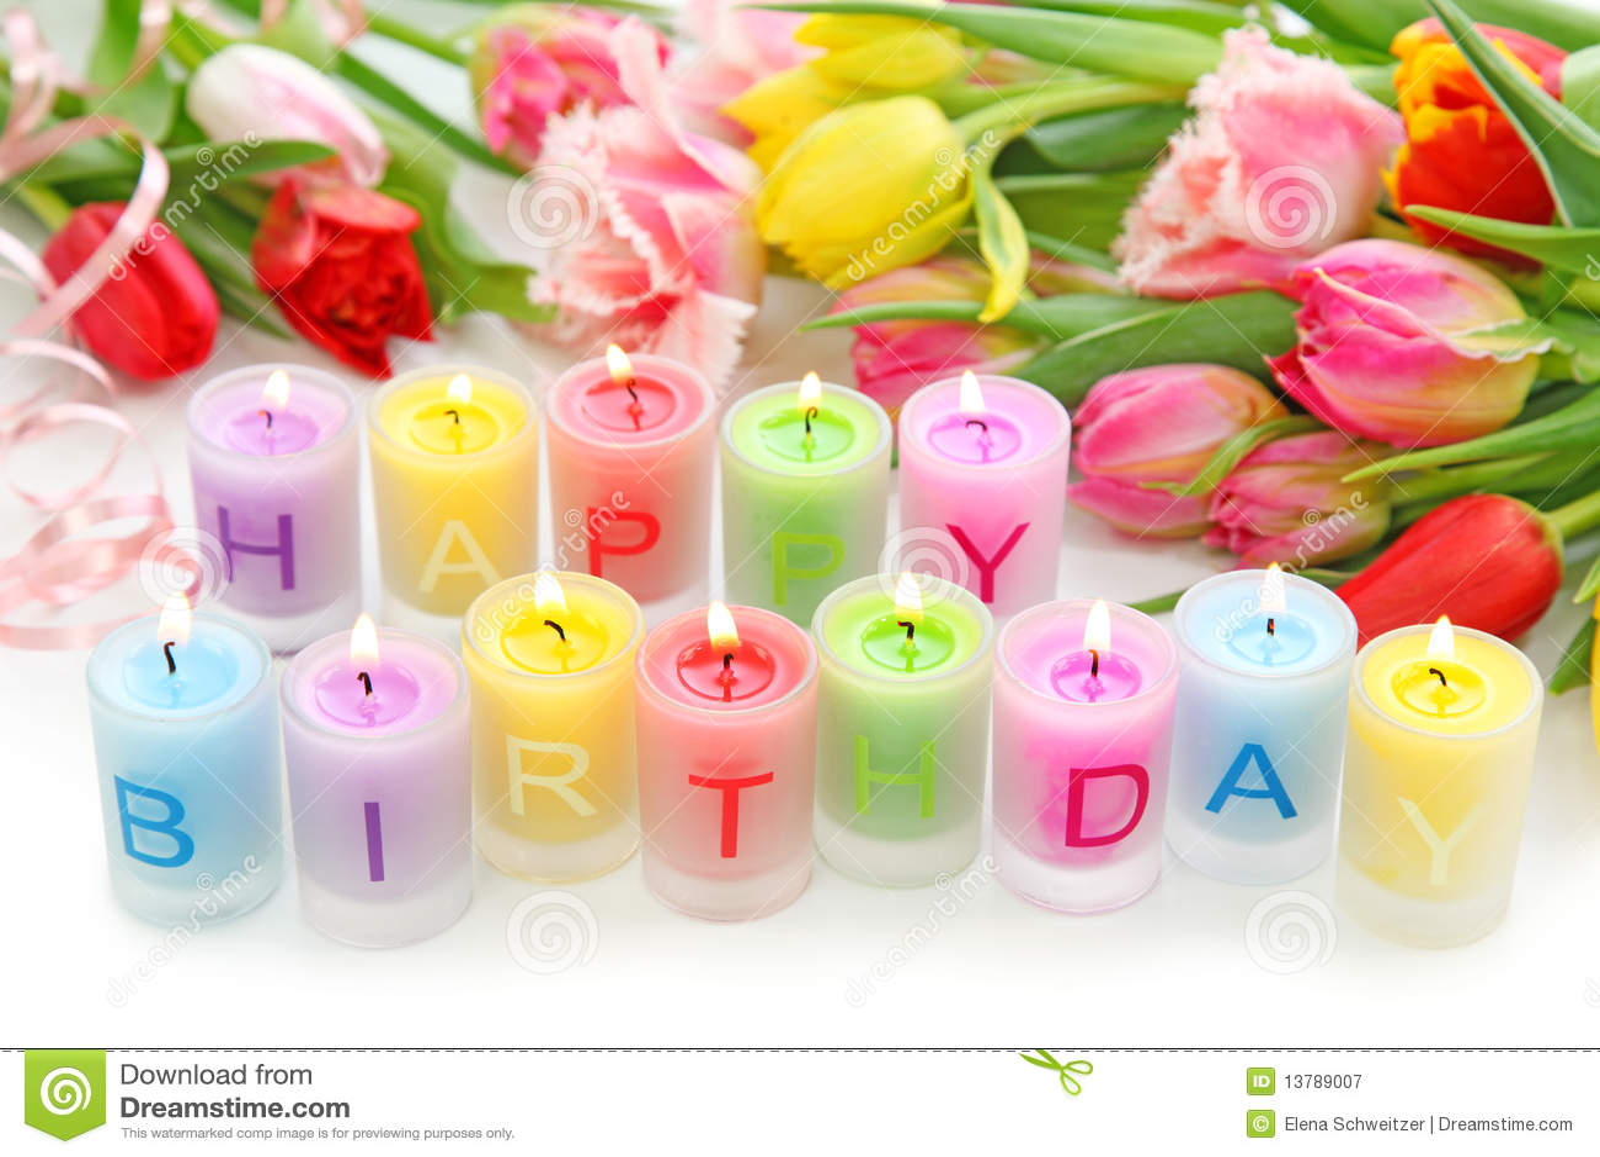 Free Birthday Invitation Maker with adorable invitations ideas